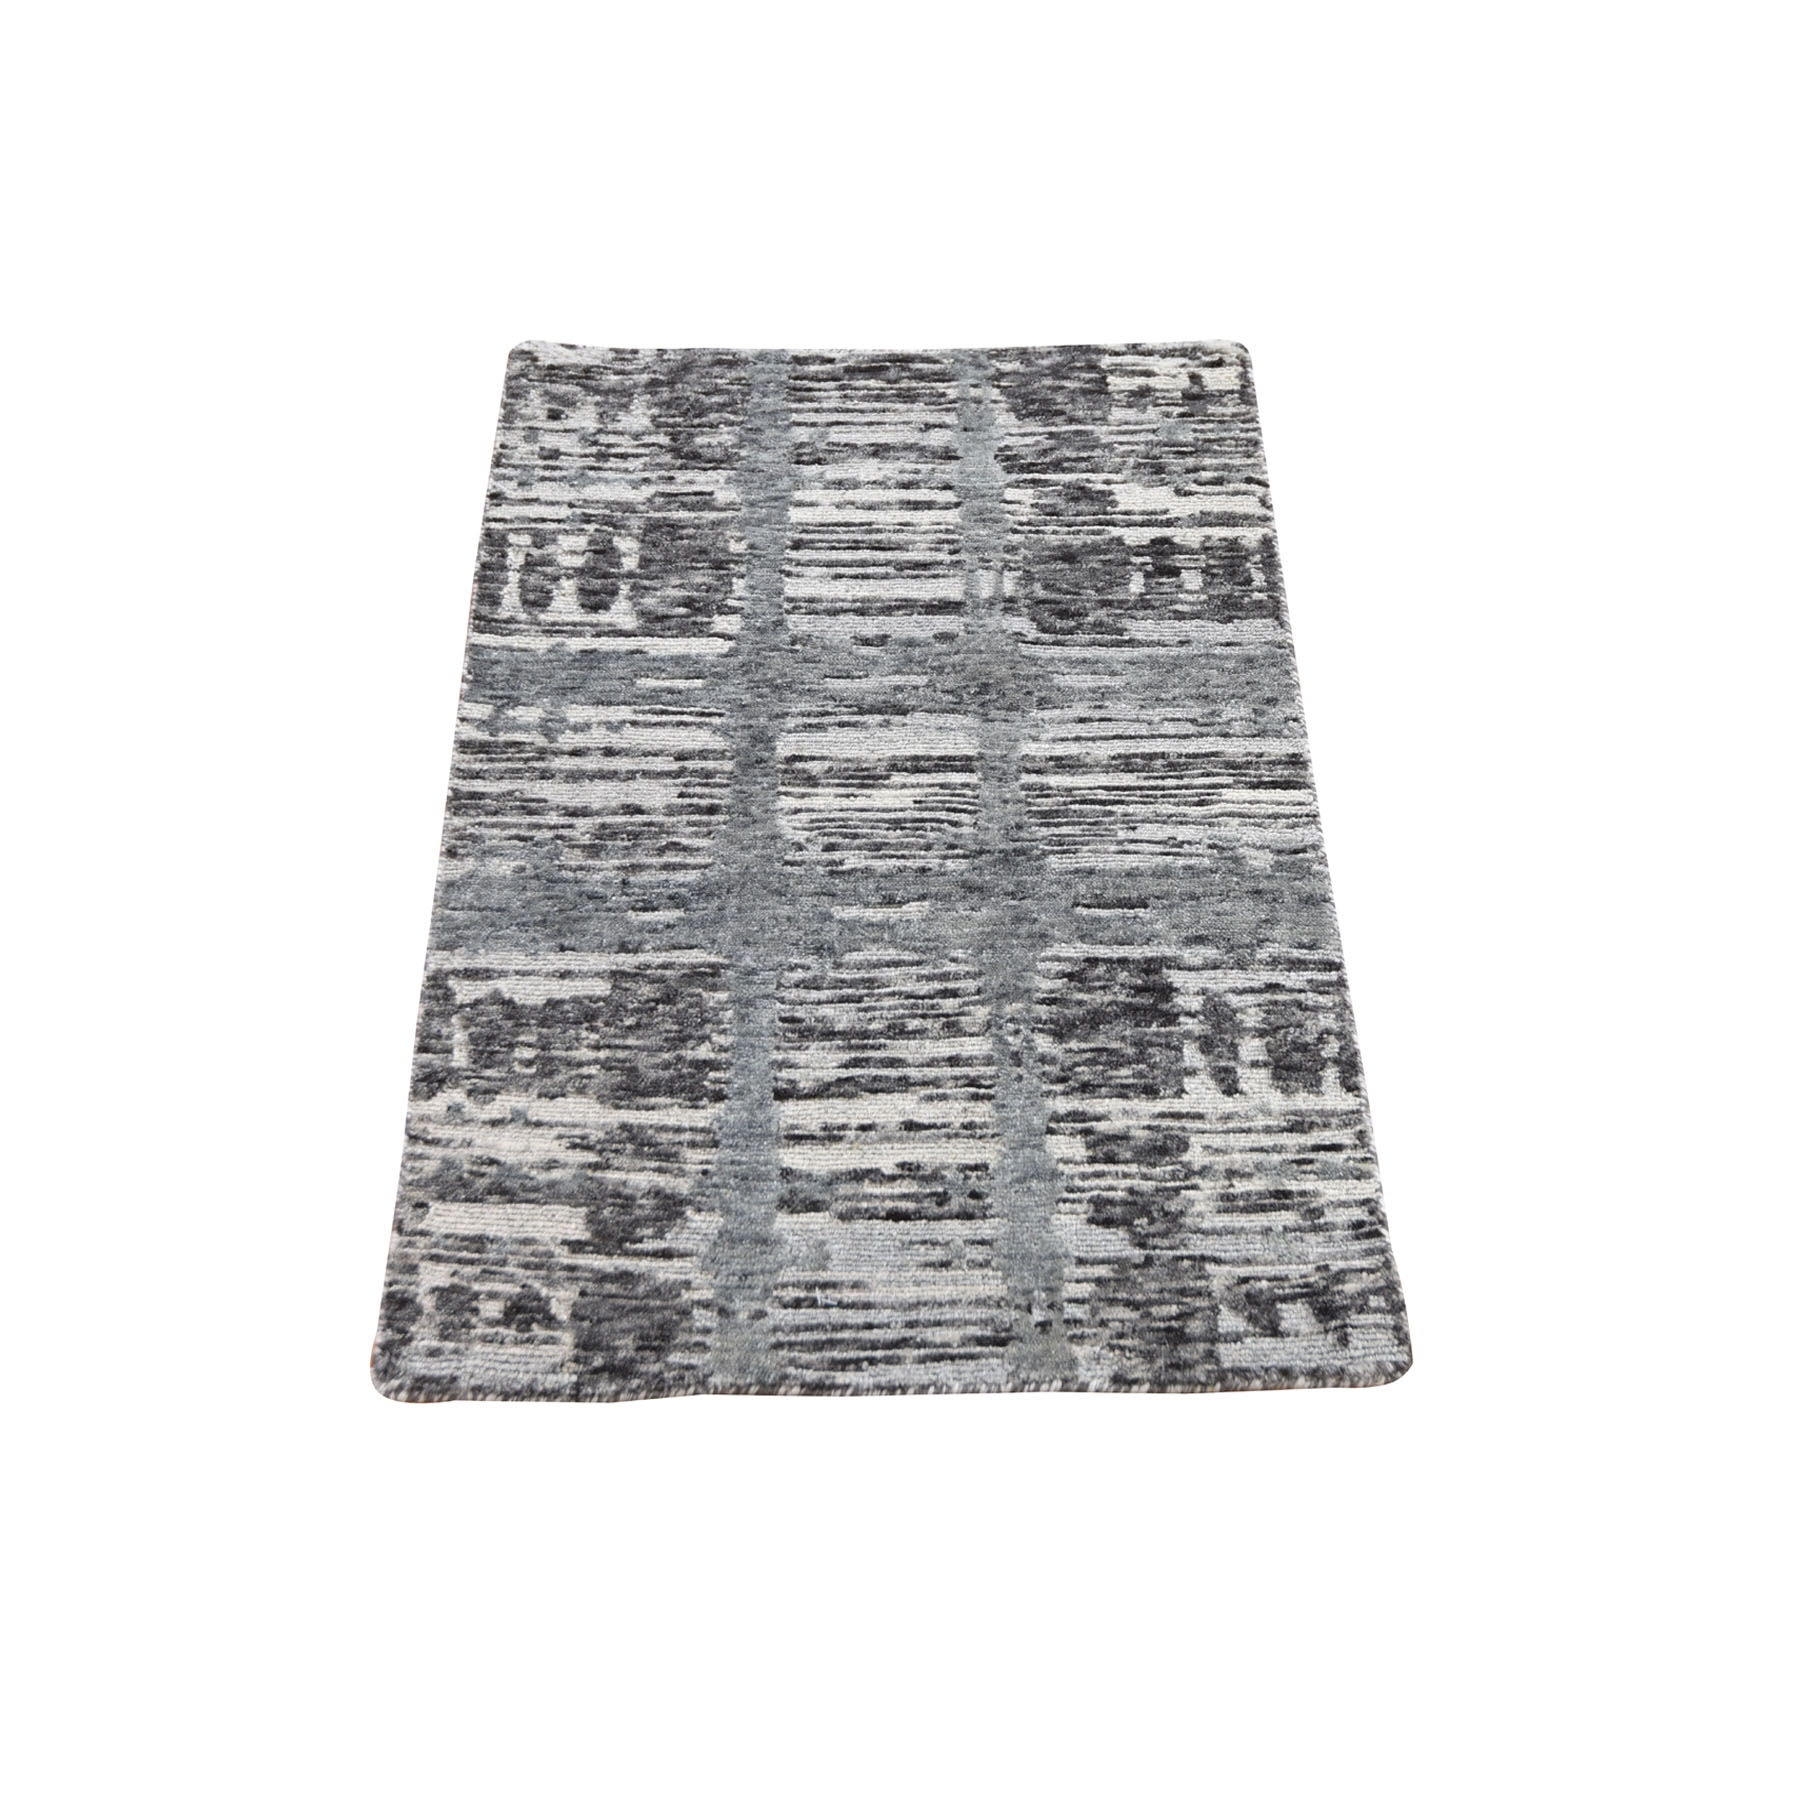 2'x3' Gray Hand Spun Undyed Natural Wool Modern Hand Knotted Oriental Rug